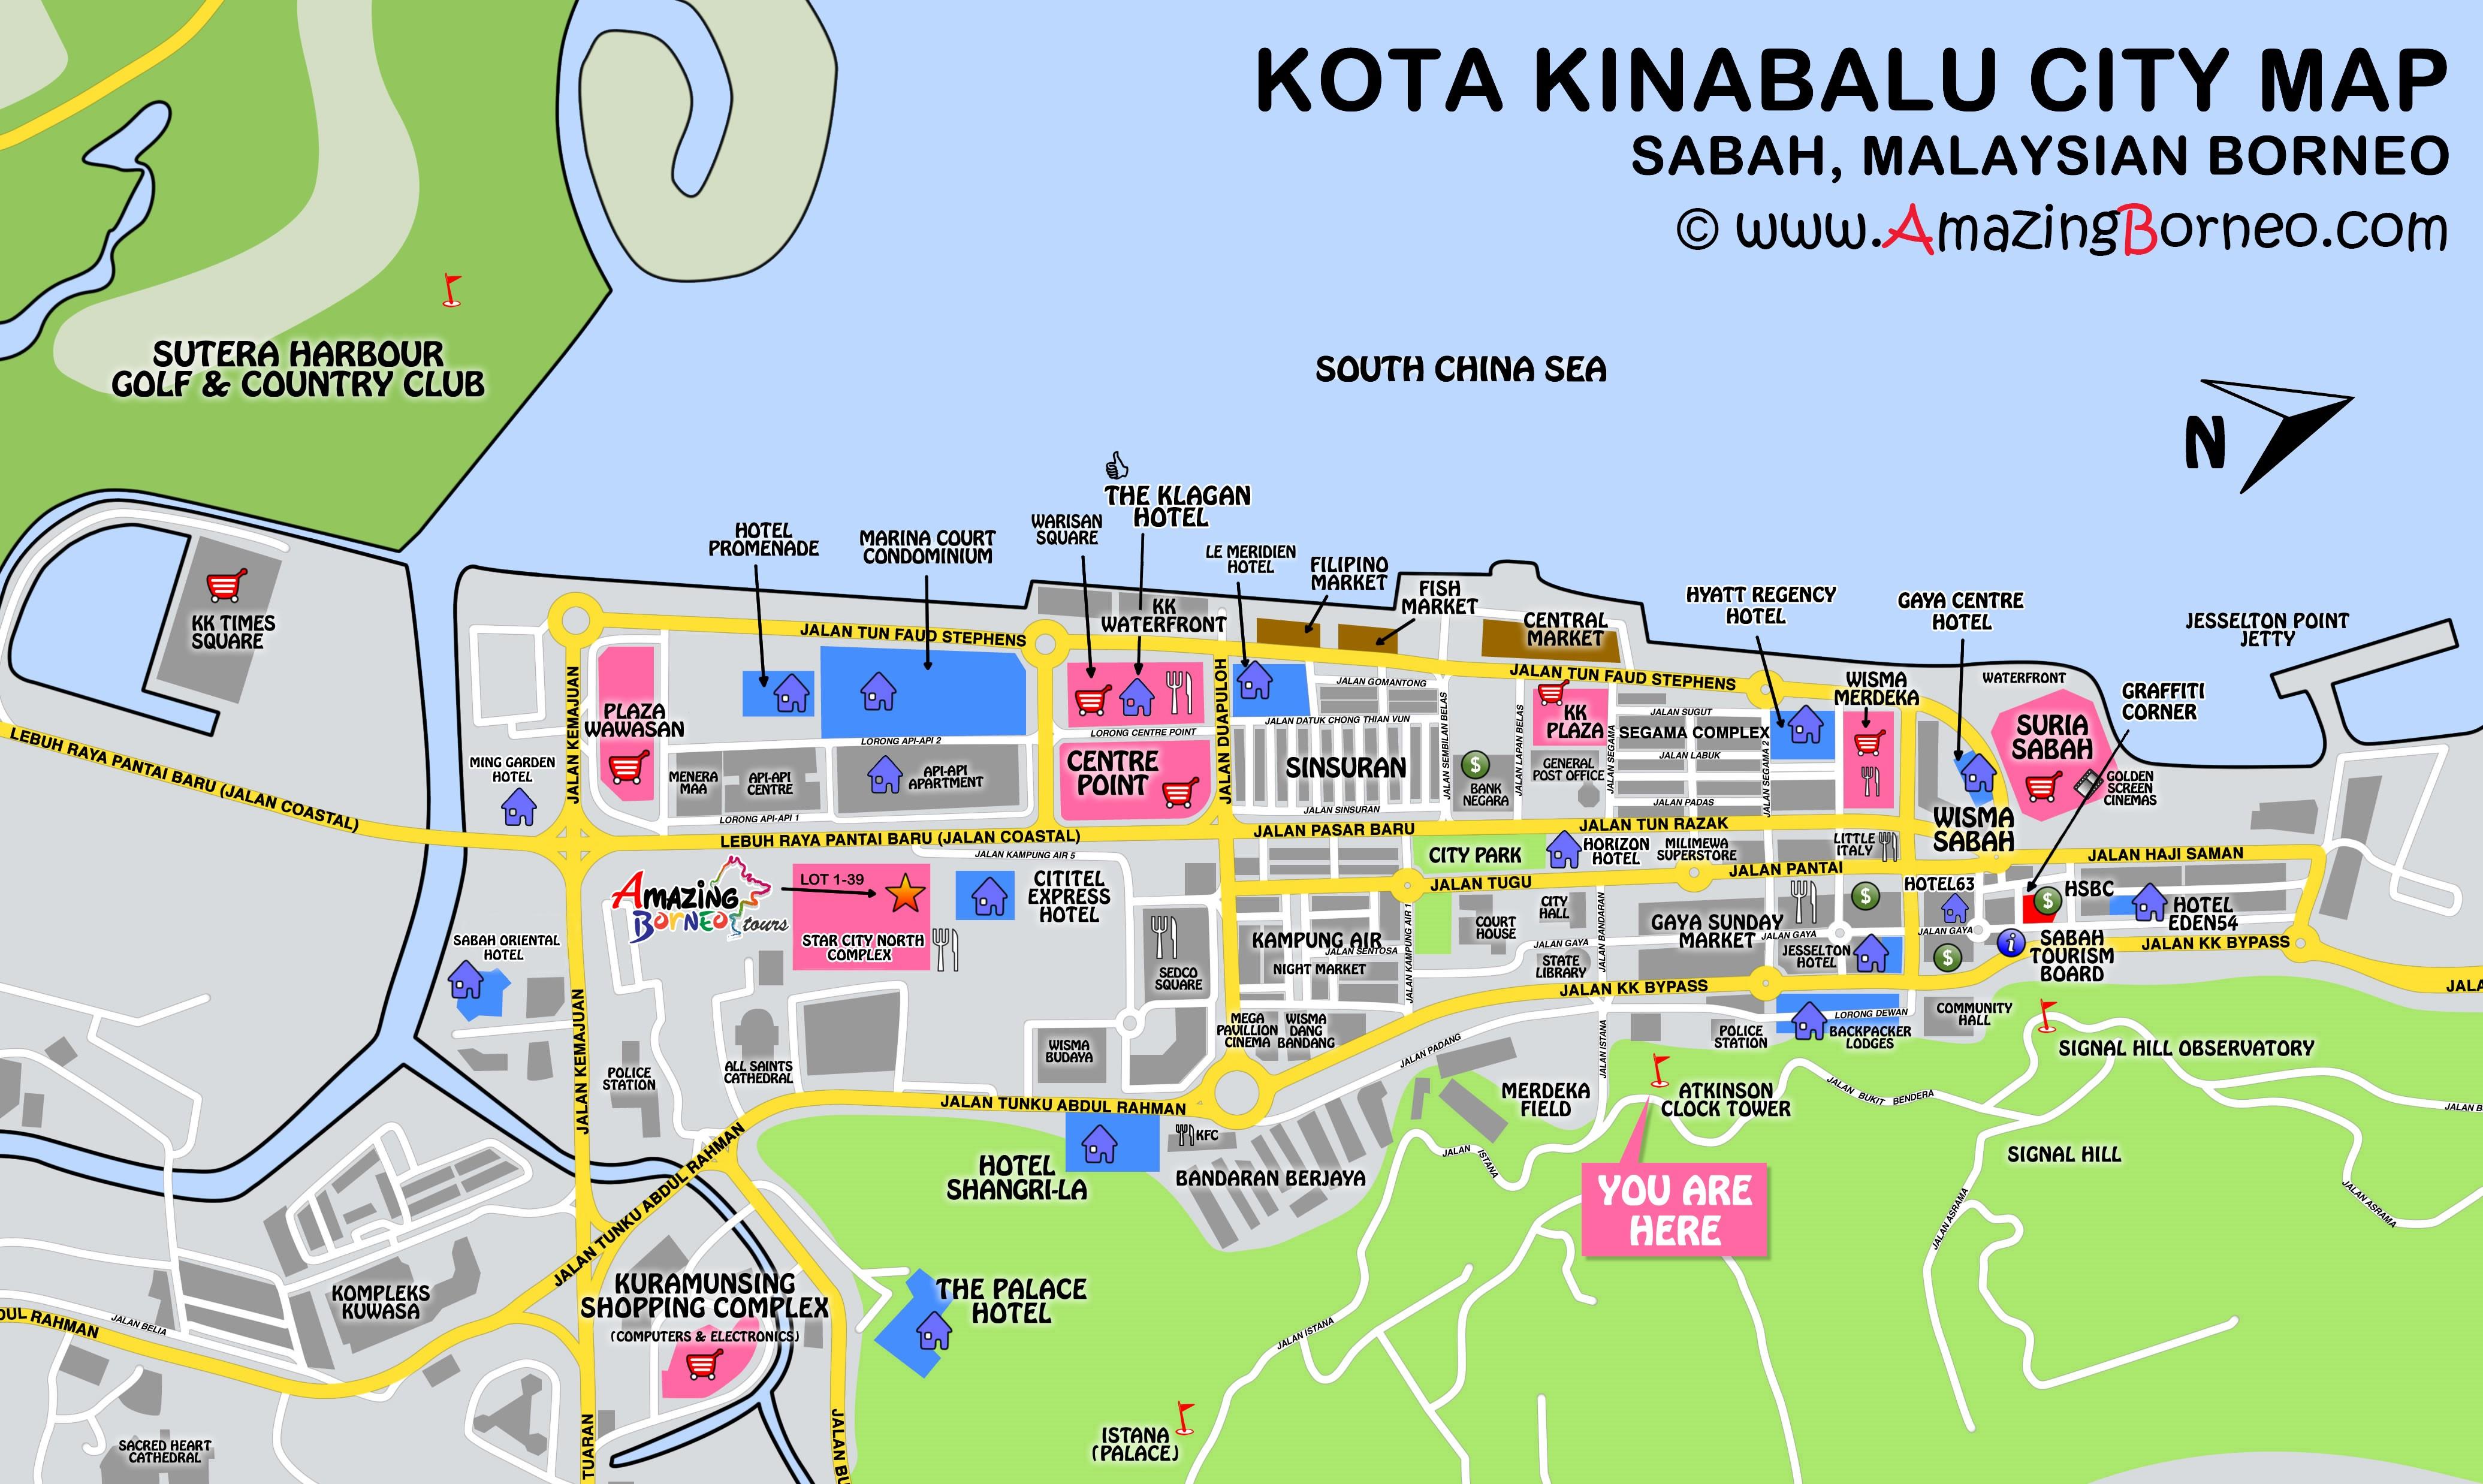 my school holiday kota kinabalu Hari raya haji, 22/08/2018 national day, 31/08/2018 spb ydp agong's  birthday, 09/09/2018 awal muharam, 11/09/2018 malaysia day, 16/09/2018.